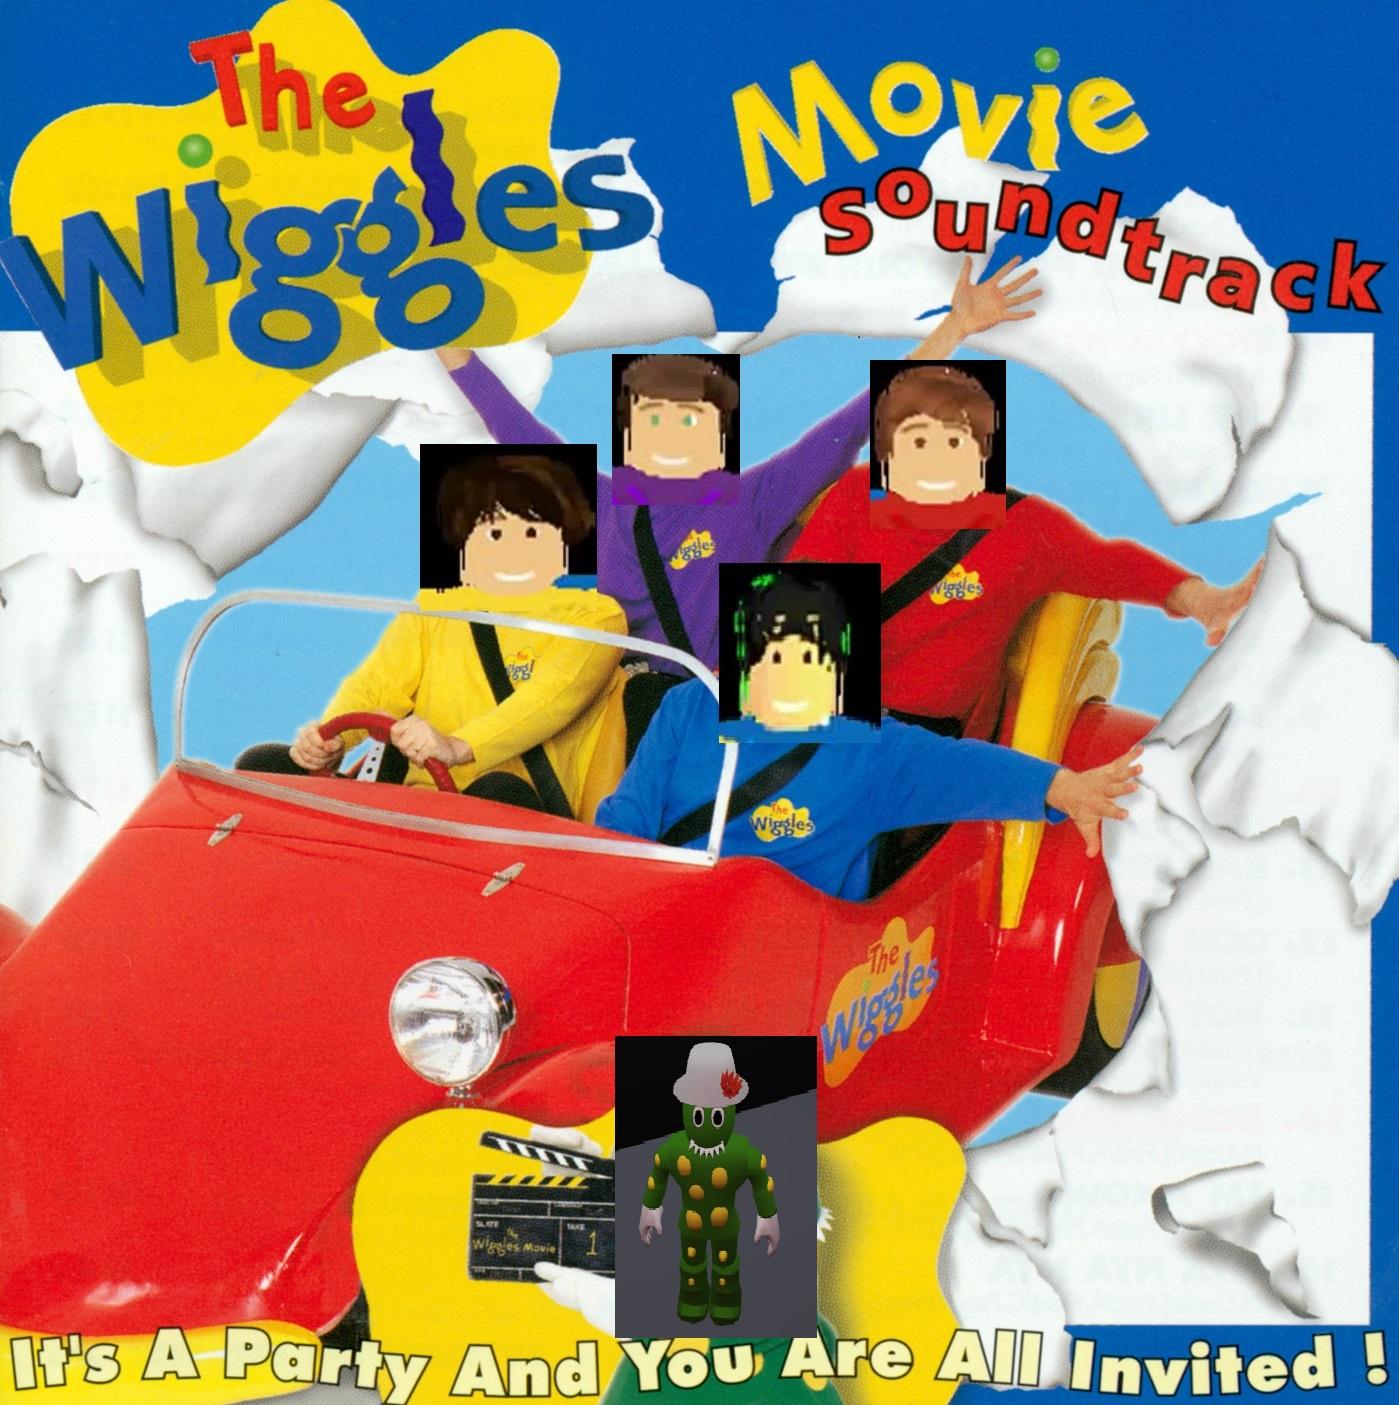 Image Ourthewigglesmoviesoundtrackjpg The Roblox Wiggles Wiki